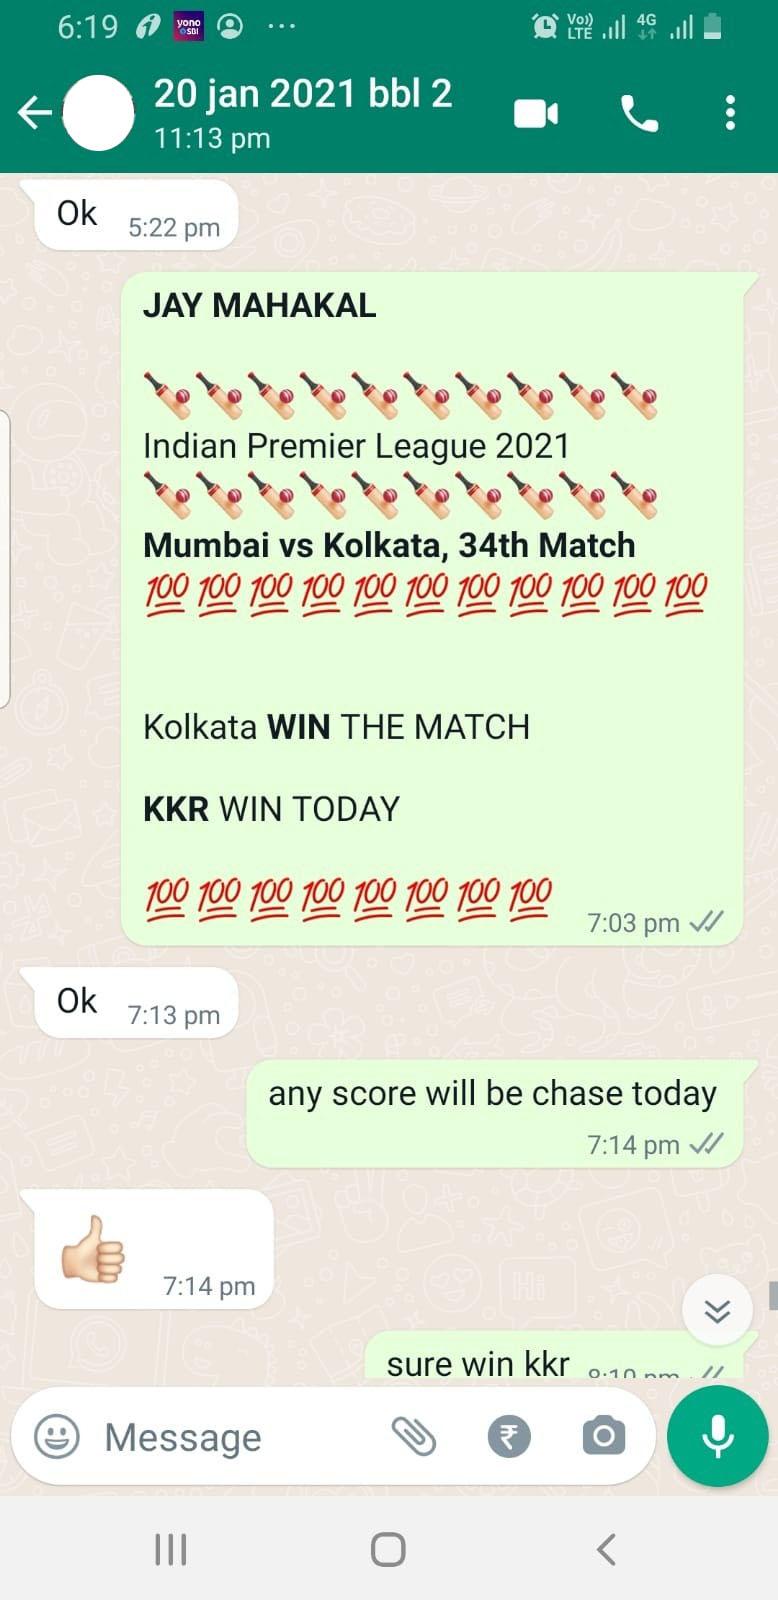 IPL last match SCreenshot for Paid Customers